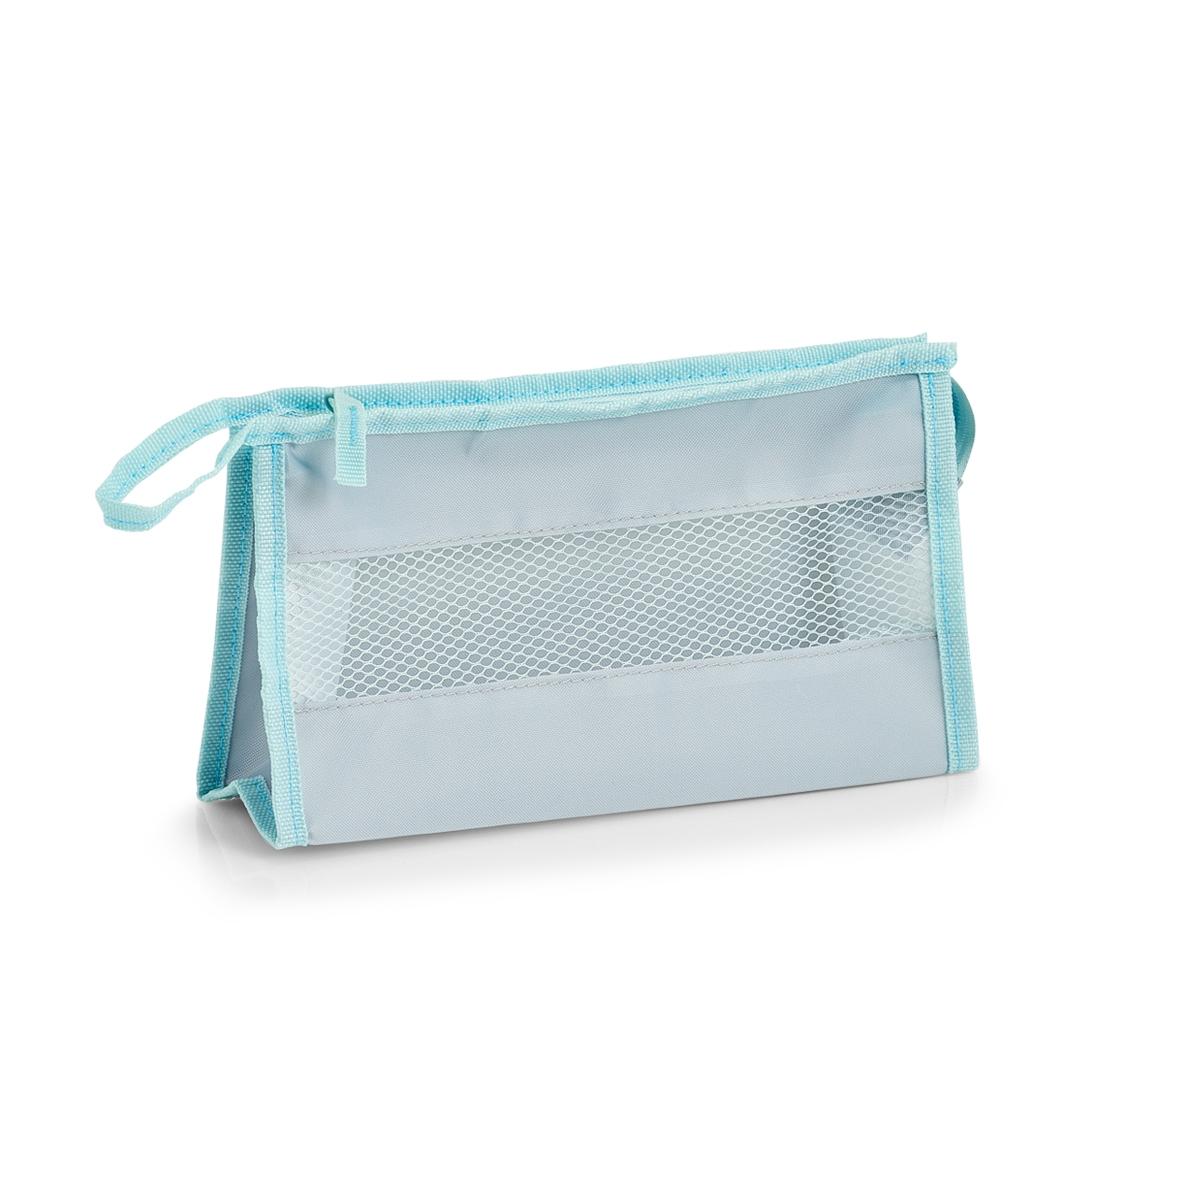 Geanta de cosmetice Suitcase Gri Deschis, l26xA9xH15 cm poza